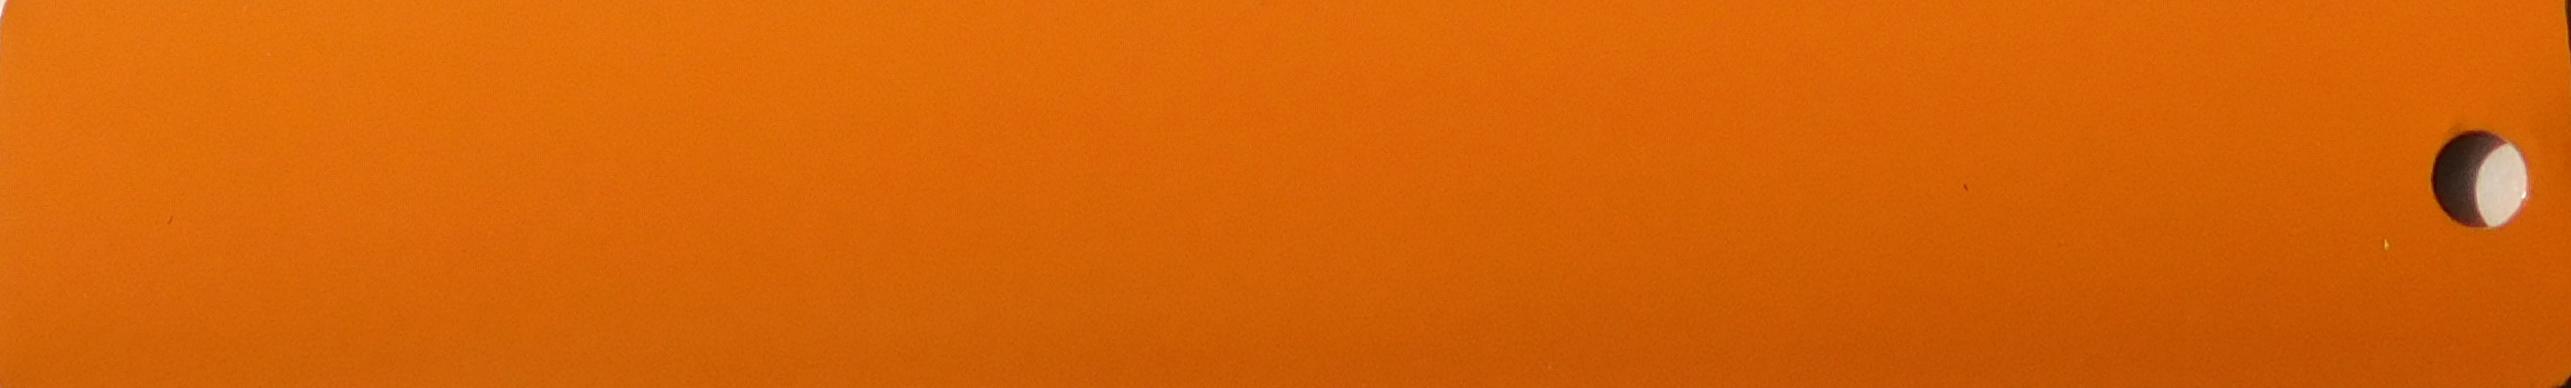 Venetian blinds slat 5752 25 mm amo standard